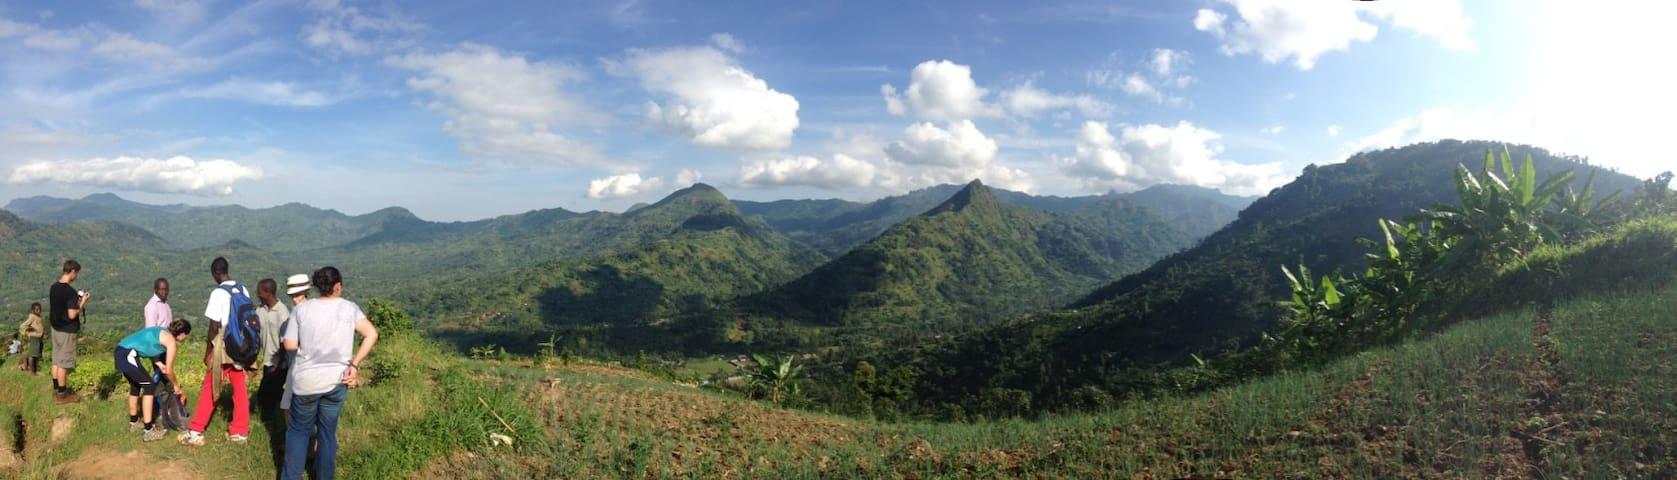 Home in lush, mountainous landscape - Bududa - House